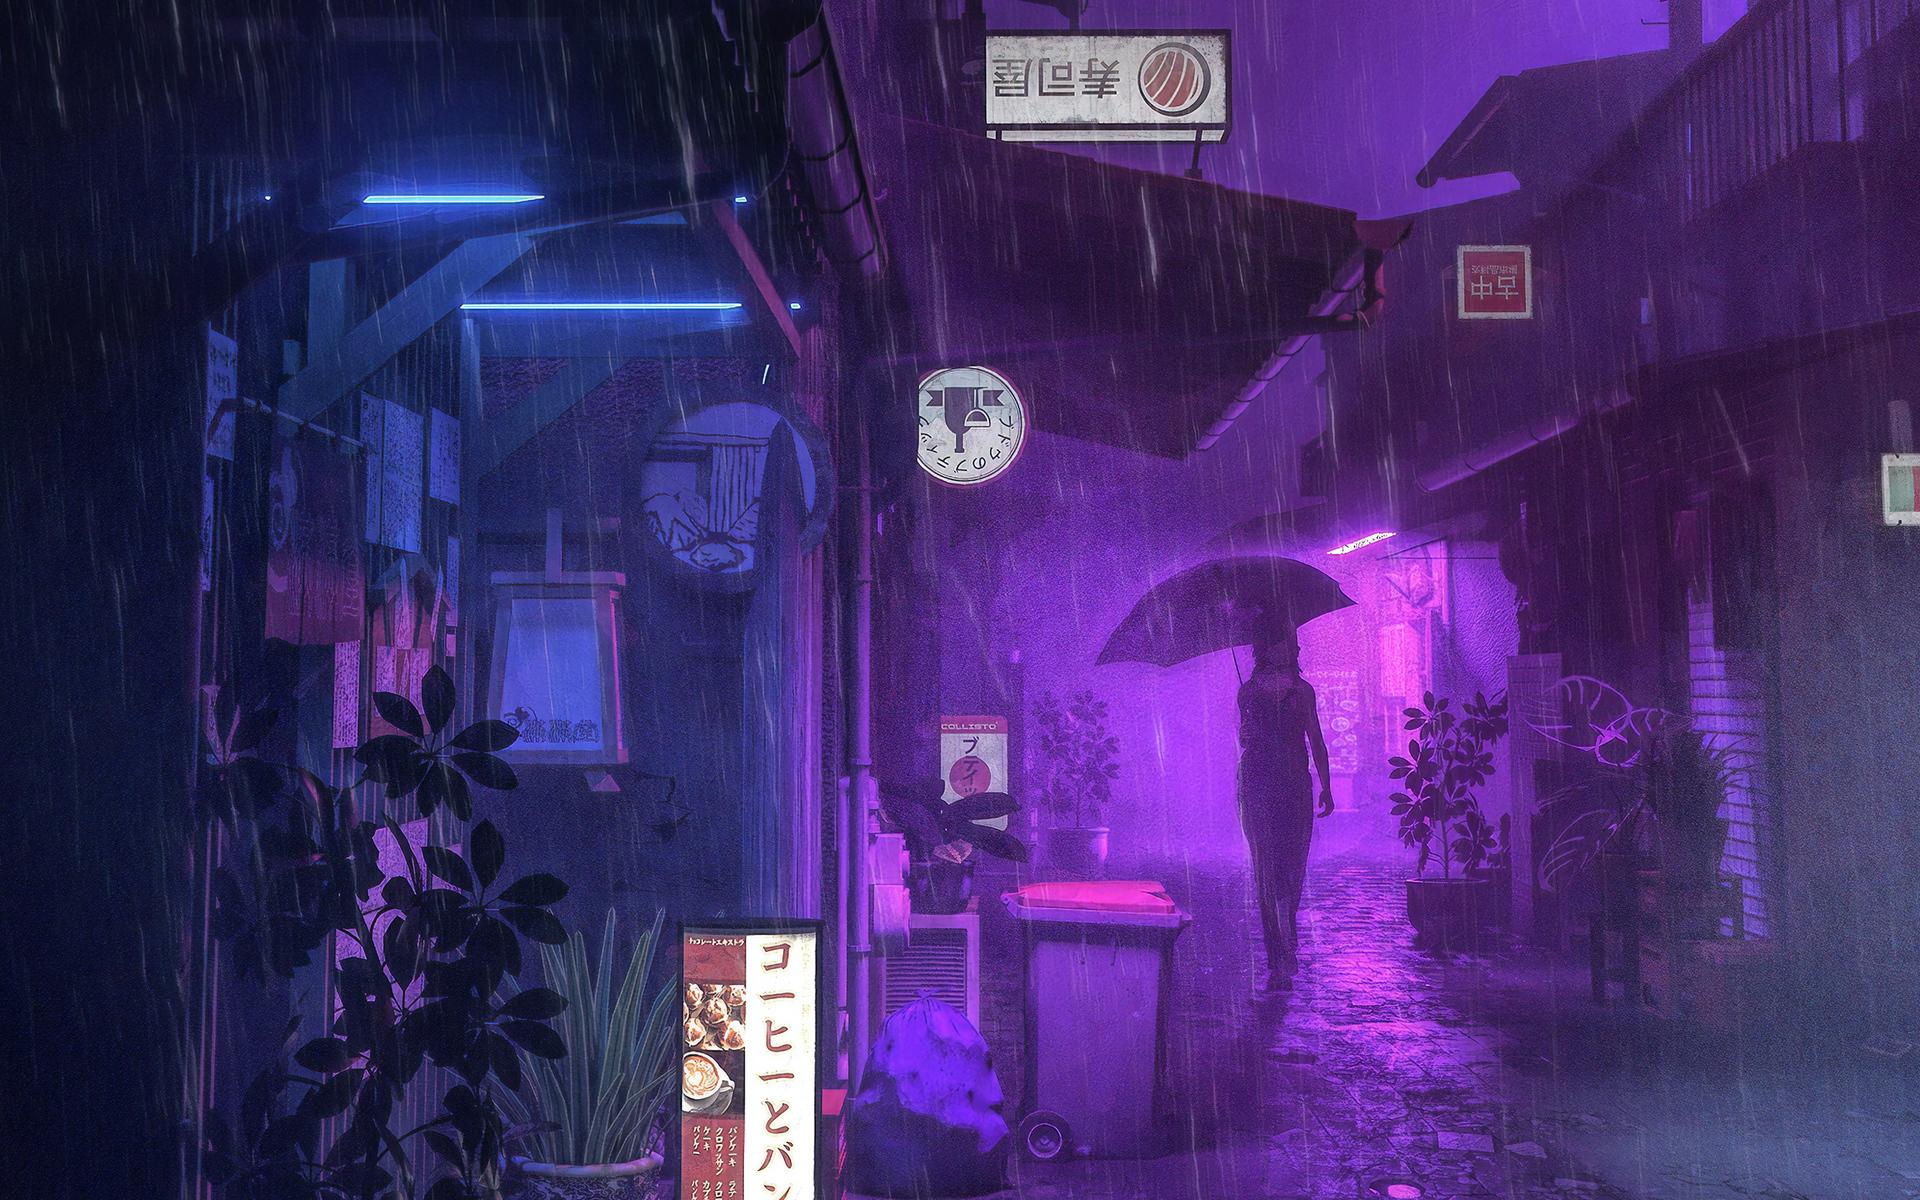 village-street-neon-girl-umbrella-y6.jpg